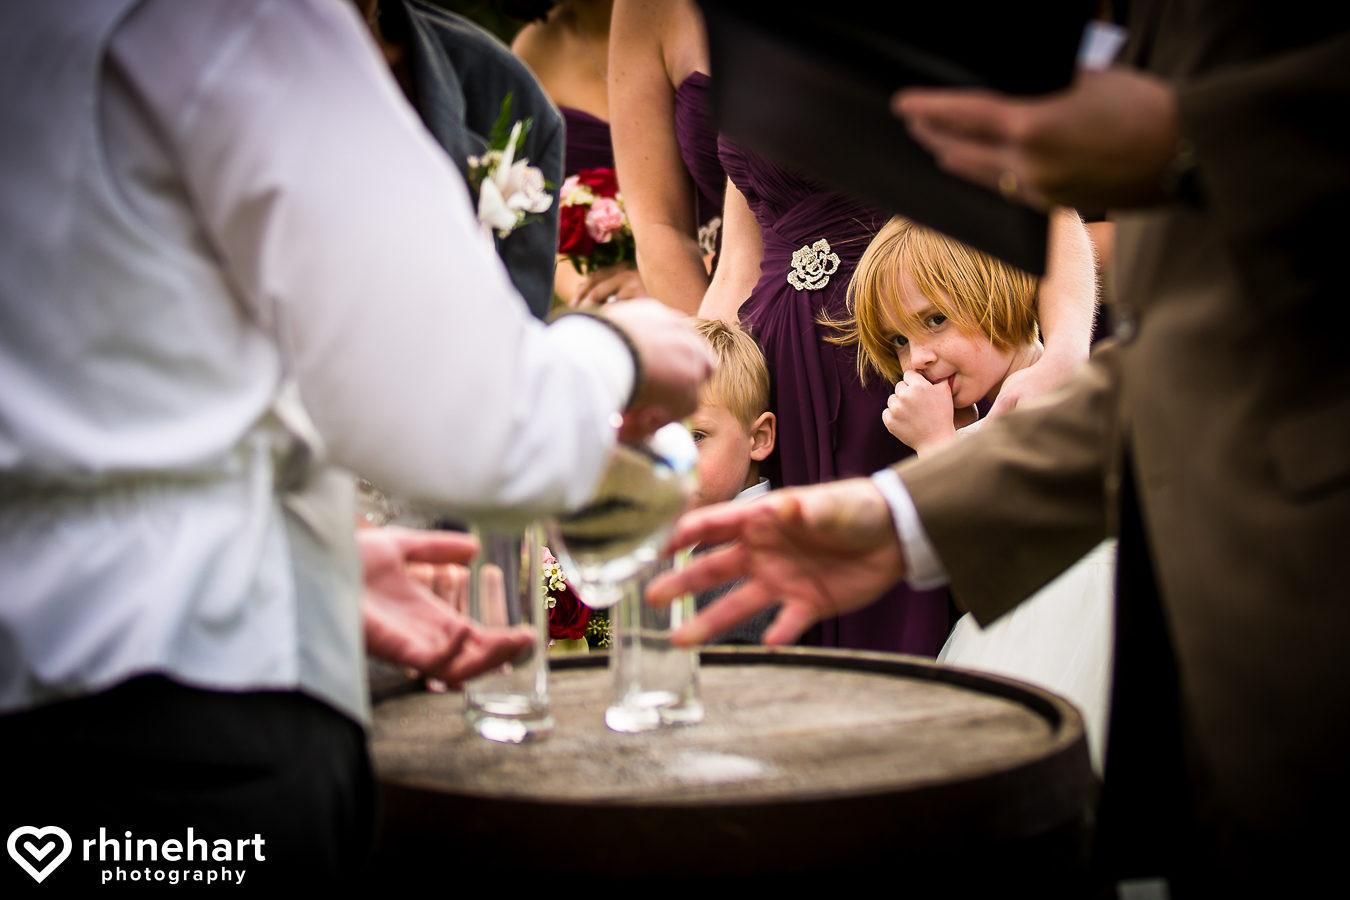 creative-unique-artistic-best-top-colorful-vibrant-emotional-pa-wedding-photographers-17